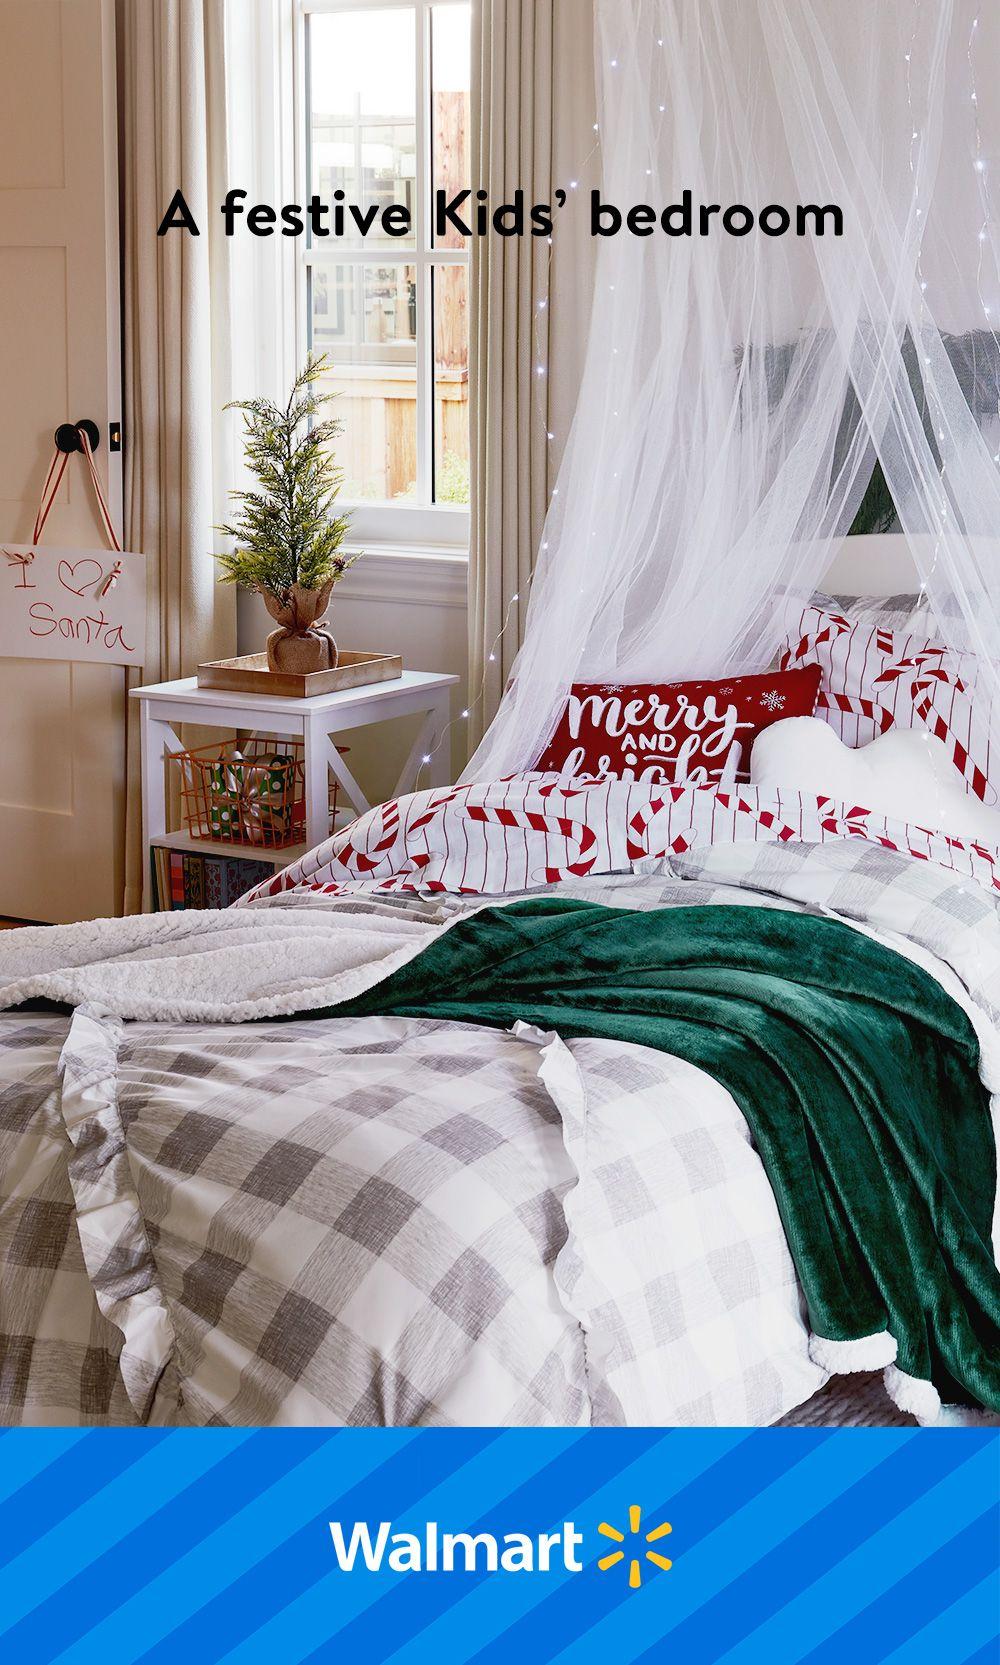 Furniture, bedding, & more